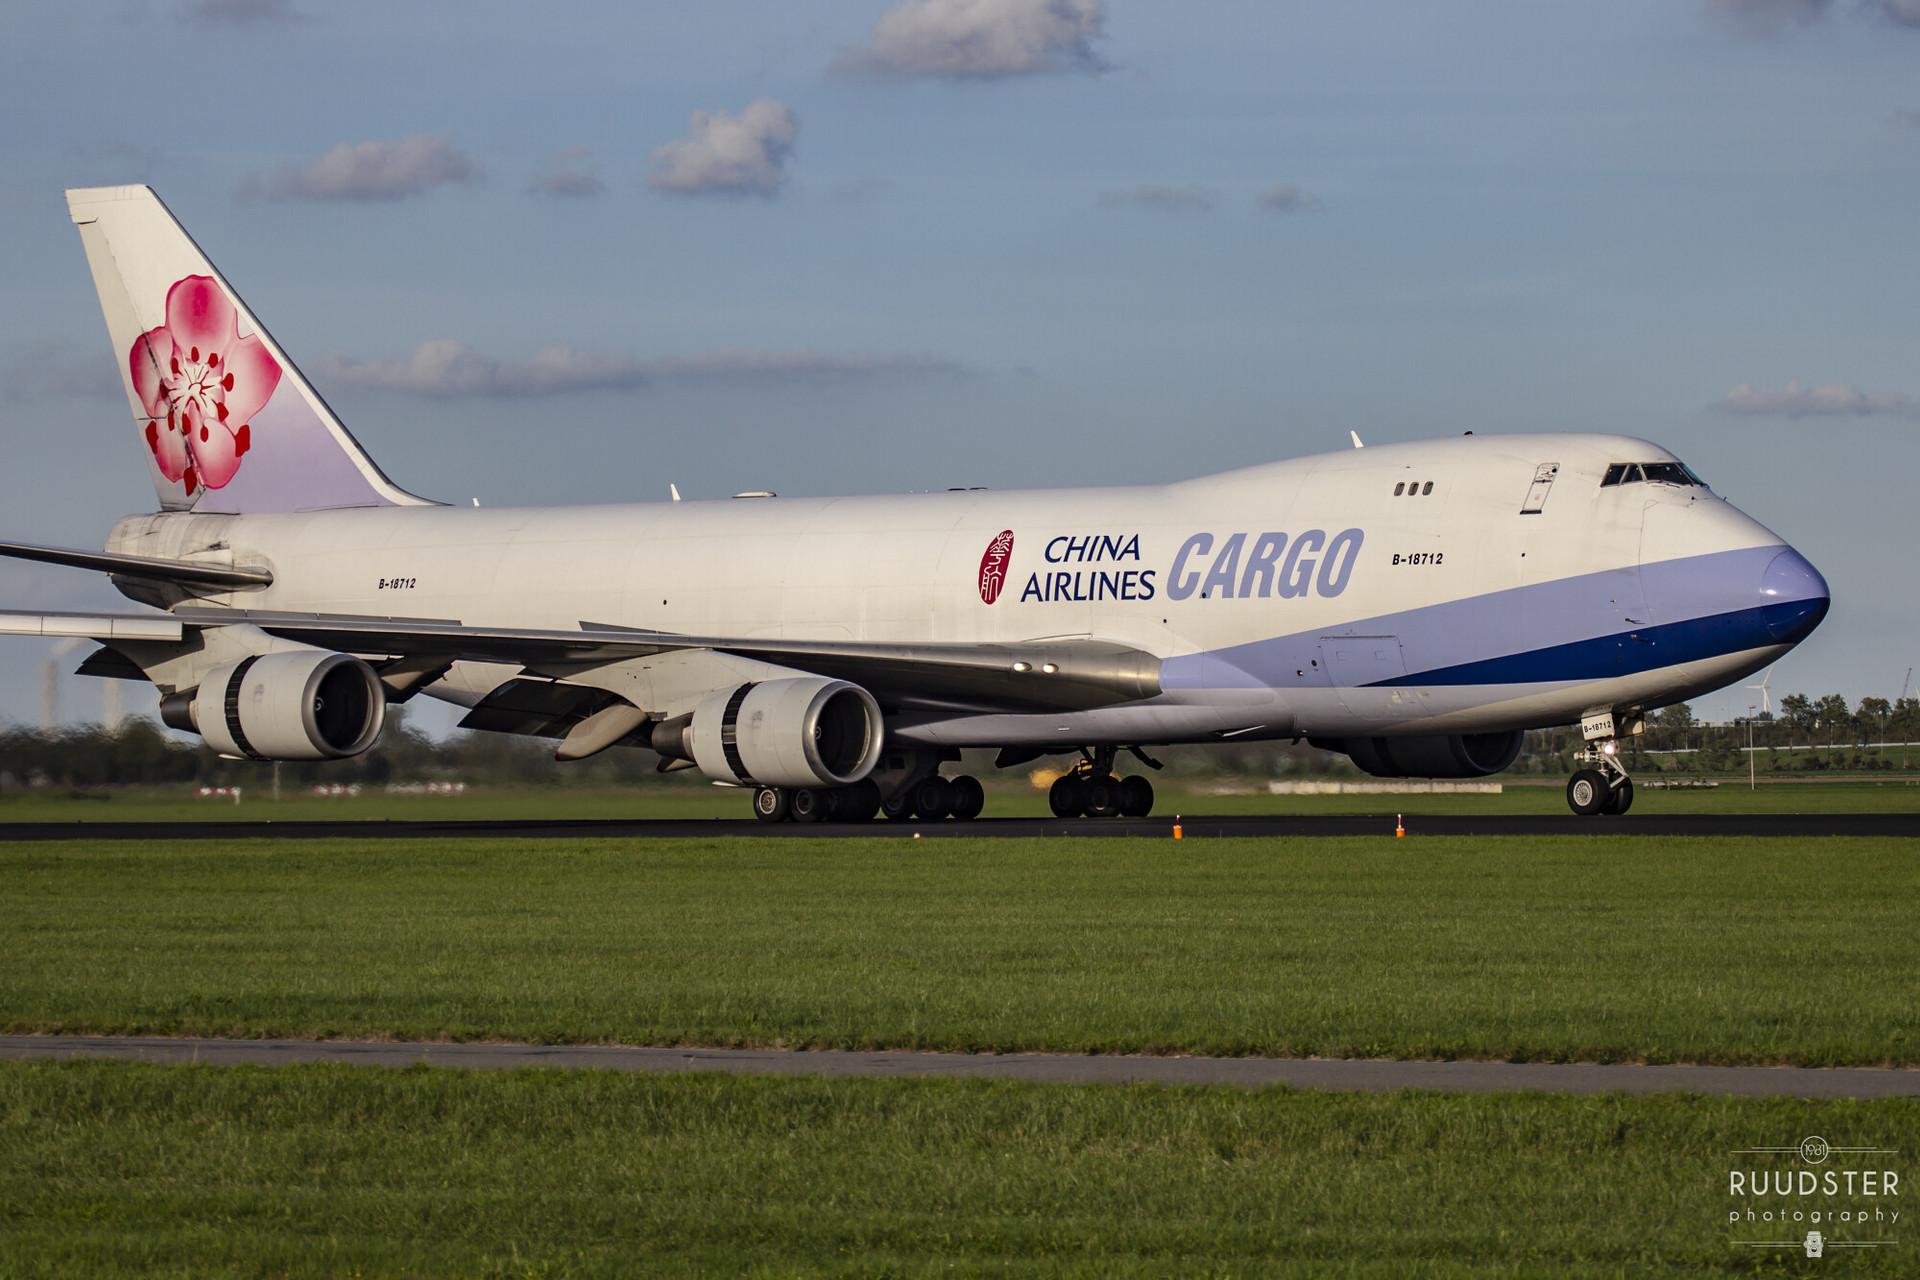 B-18712 | Build: 2003 - Boeing 747-409F